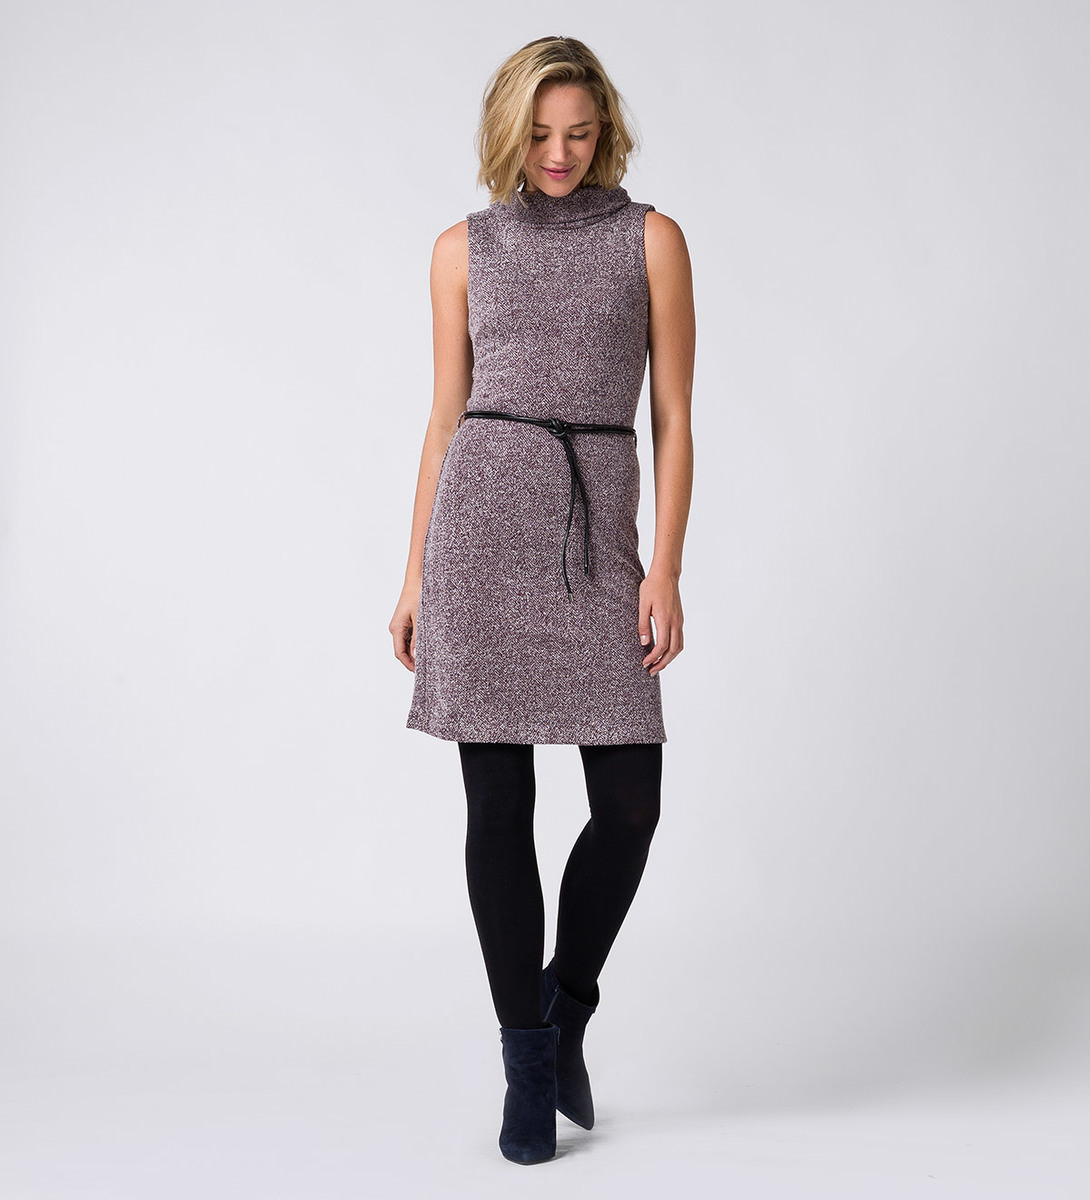 Kleid im melierten Look in plum-m